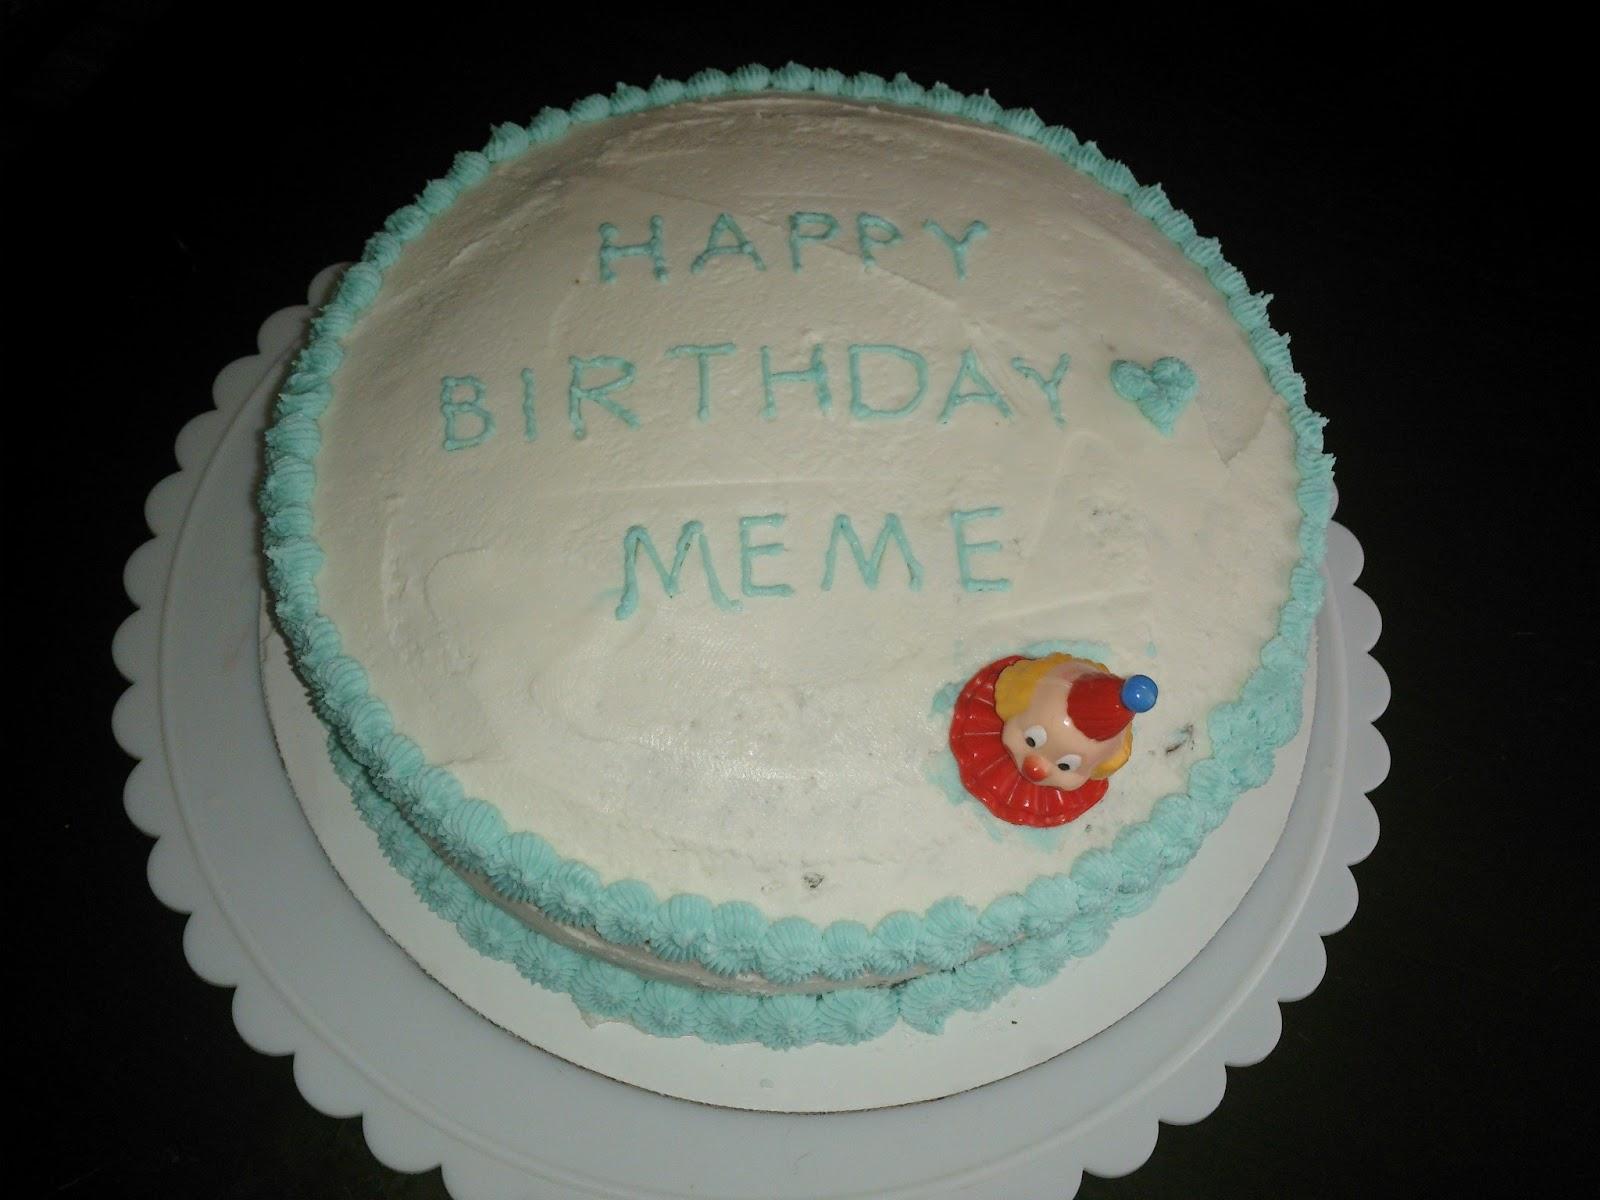 Creepy happy birthday meme says happy 37th birthday